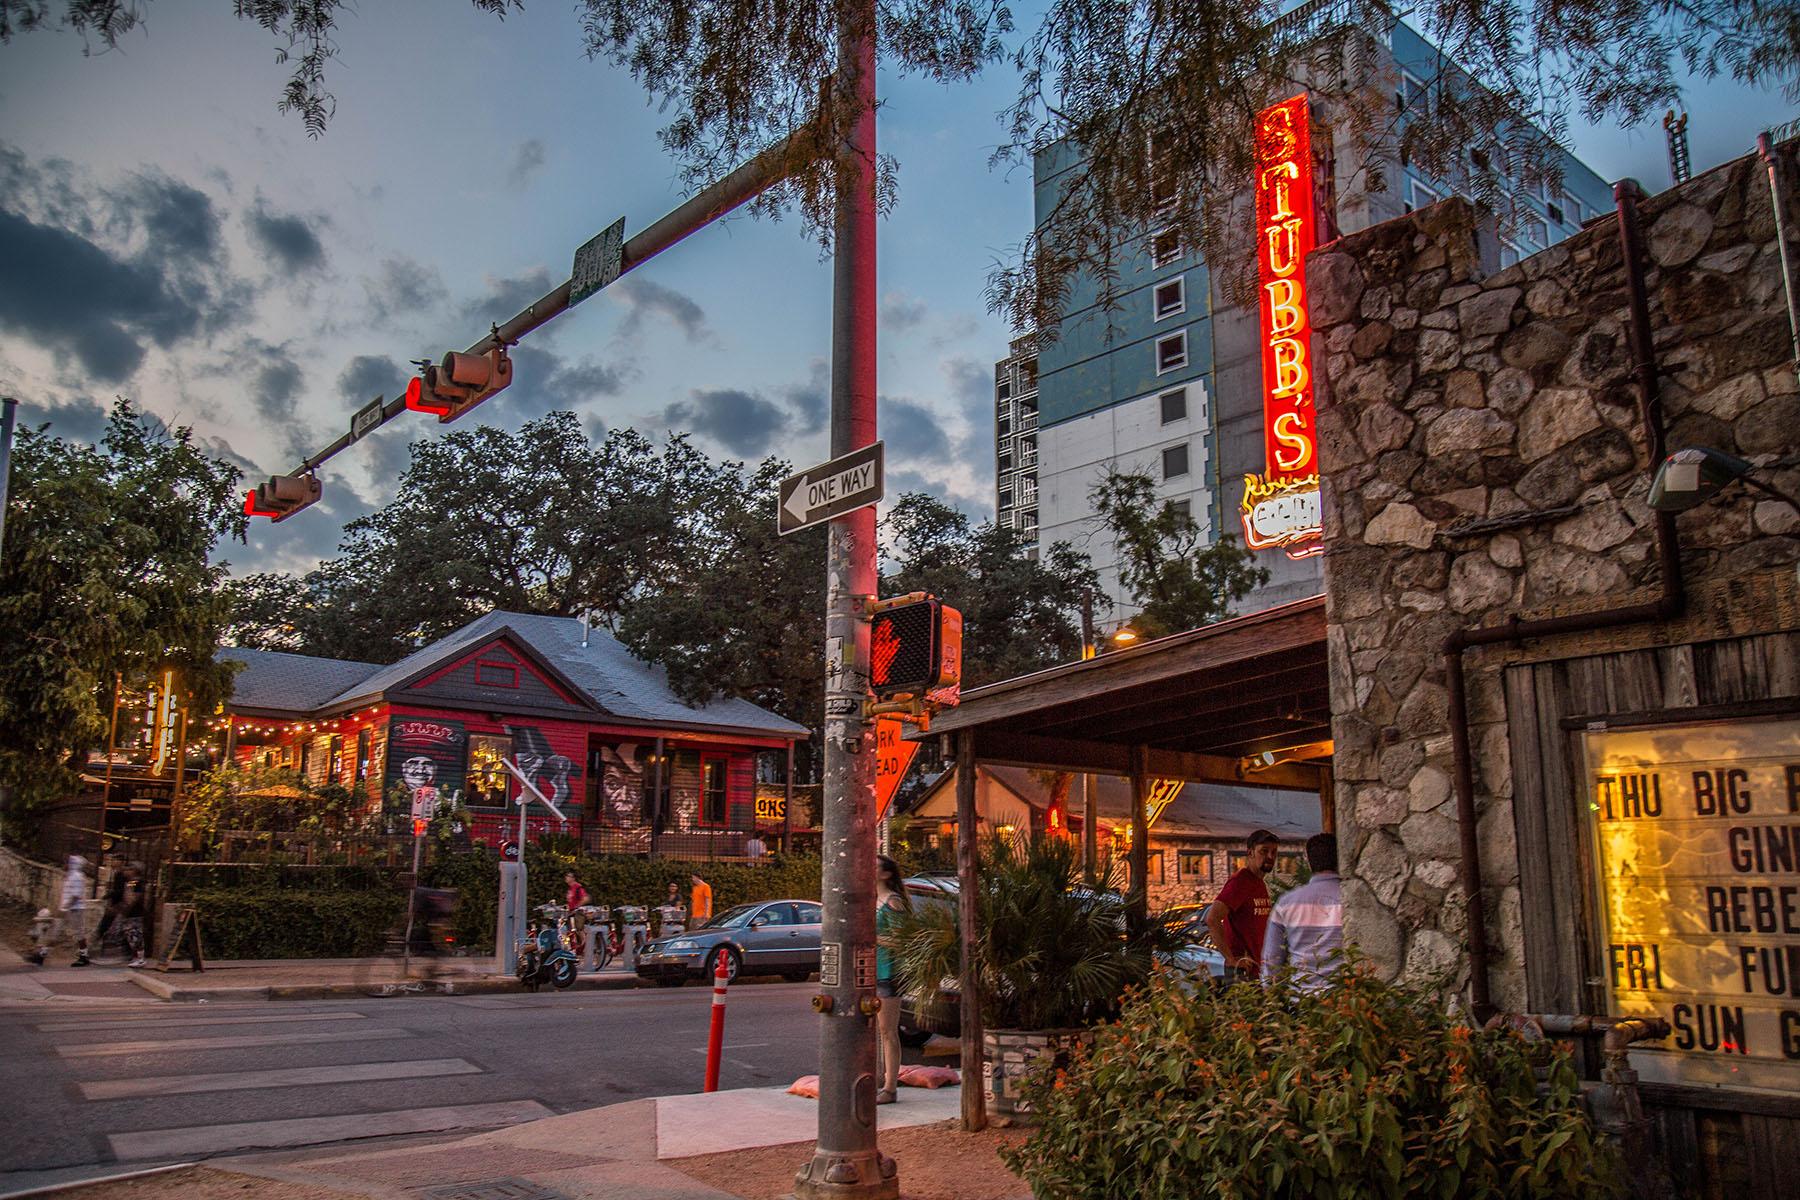 Austin's Red River Entertainment District